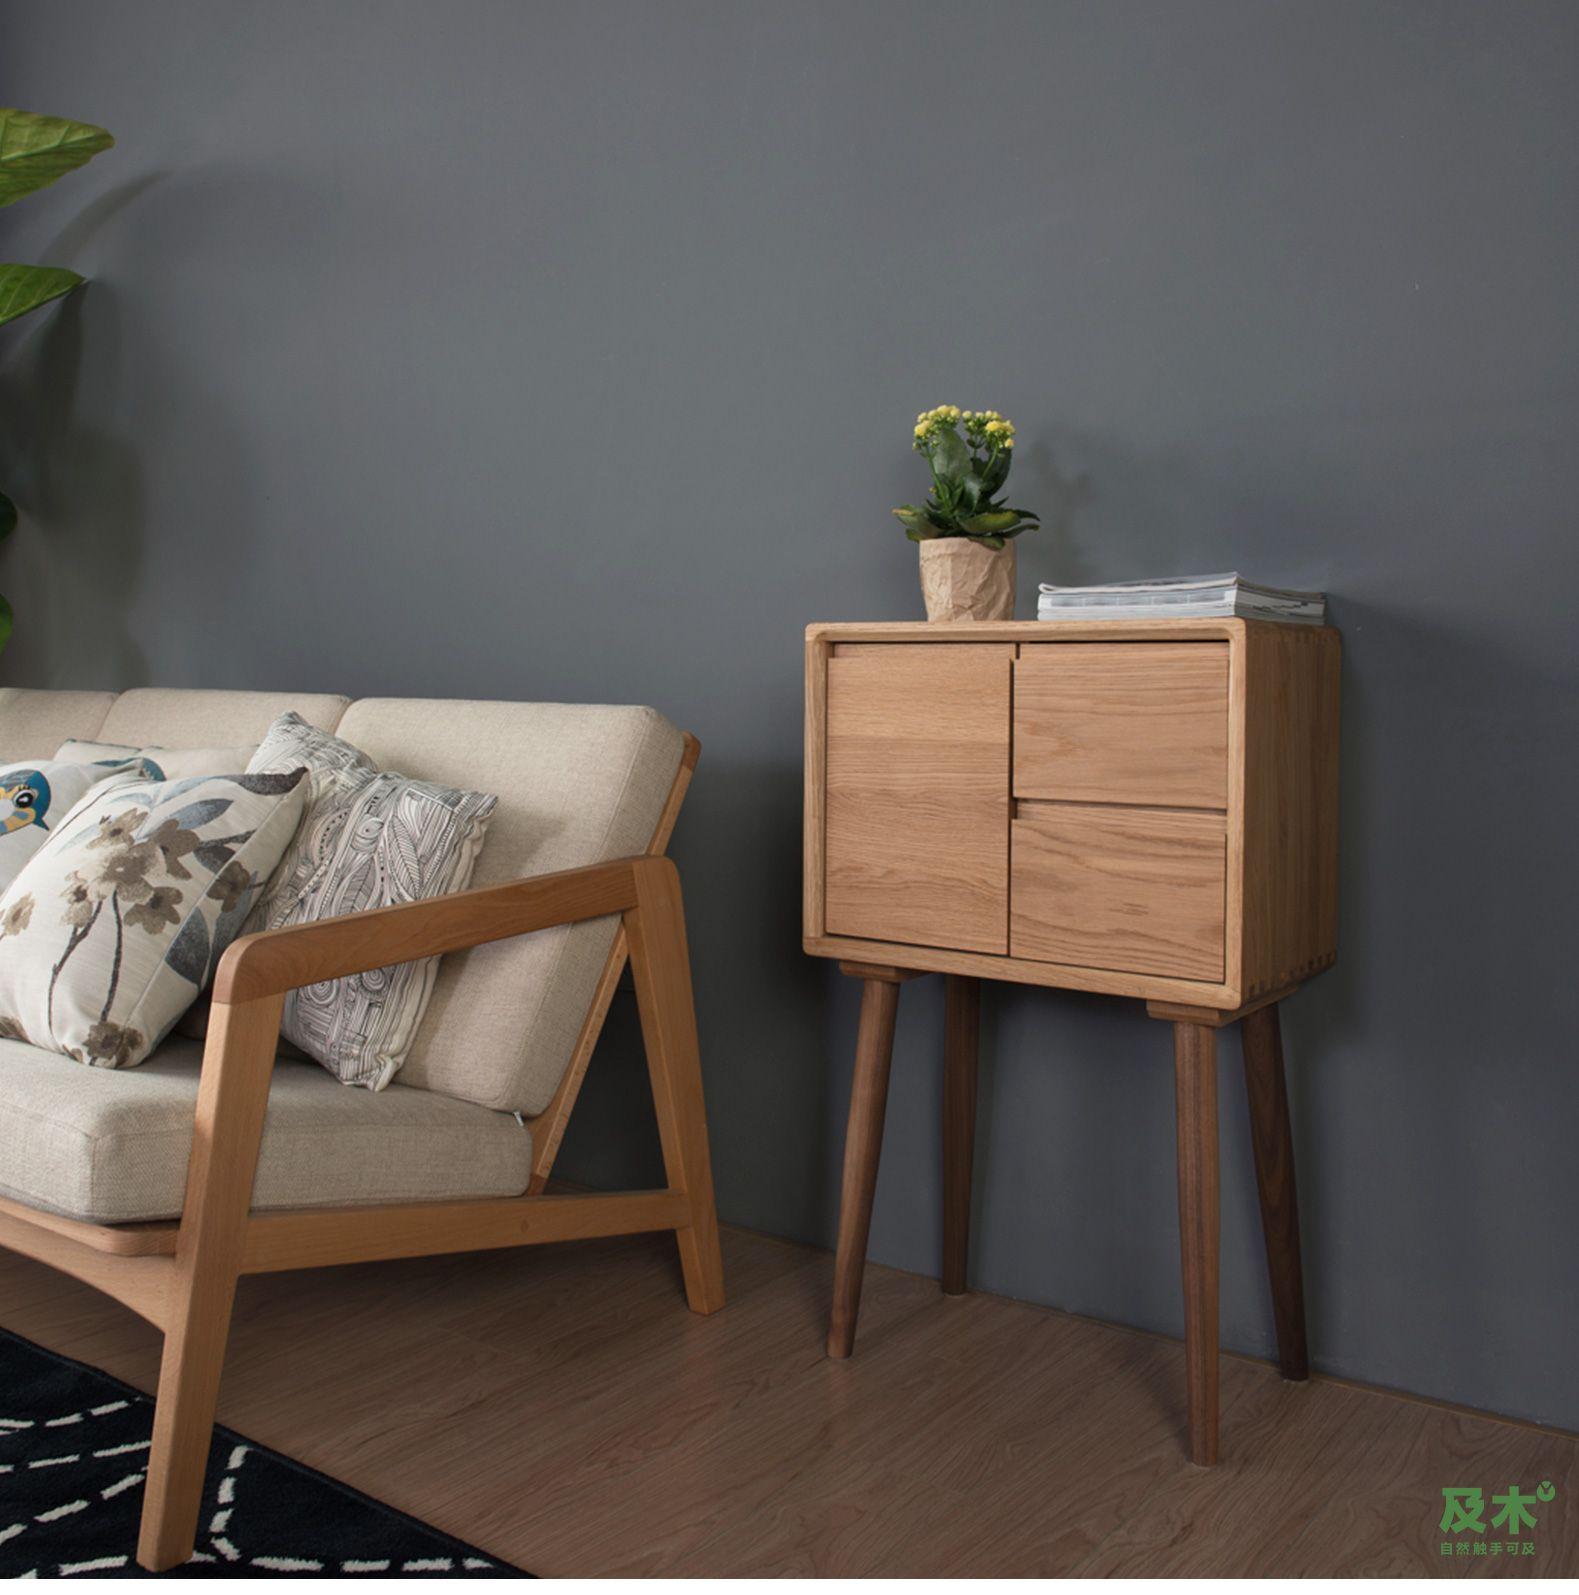 Nordic Minimalist Furniture And Wood Beech White Oak Black Walnut Living Room Accommodating Small Sideboard Dg011 Tmall Lynx